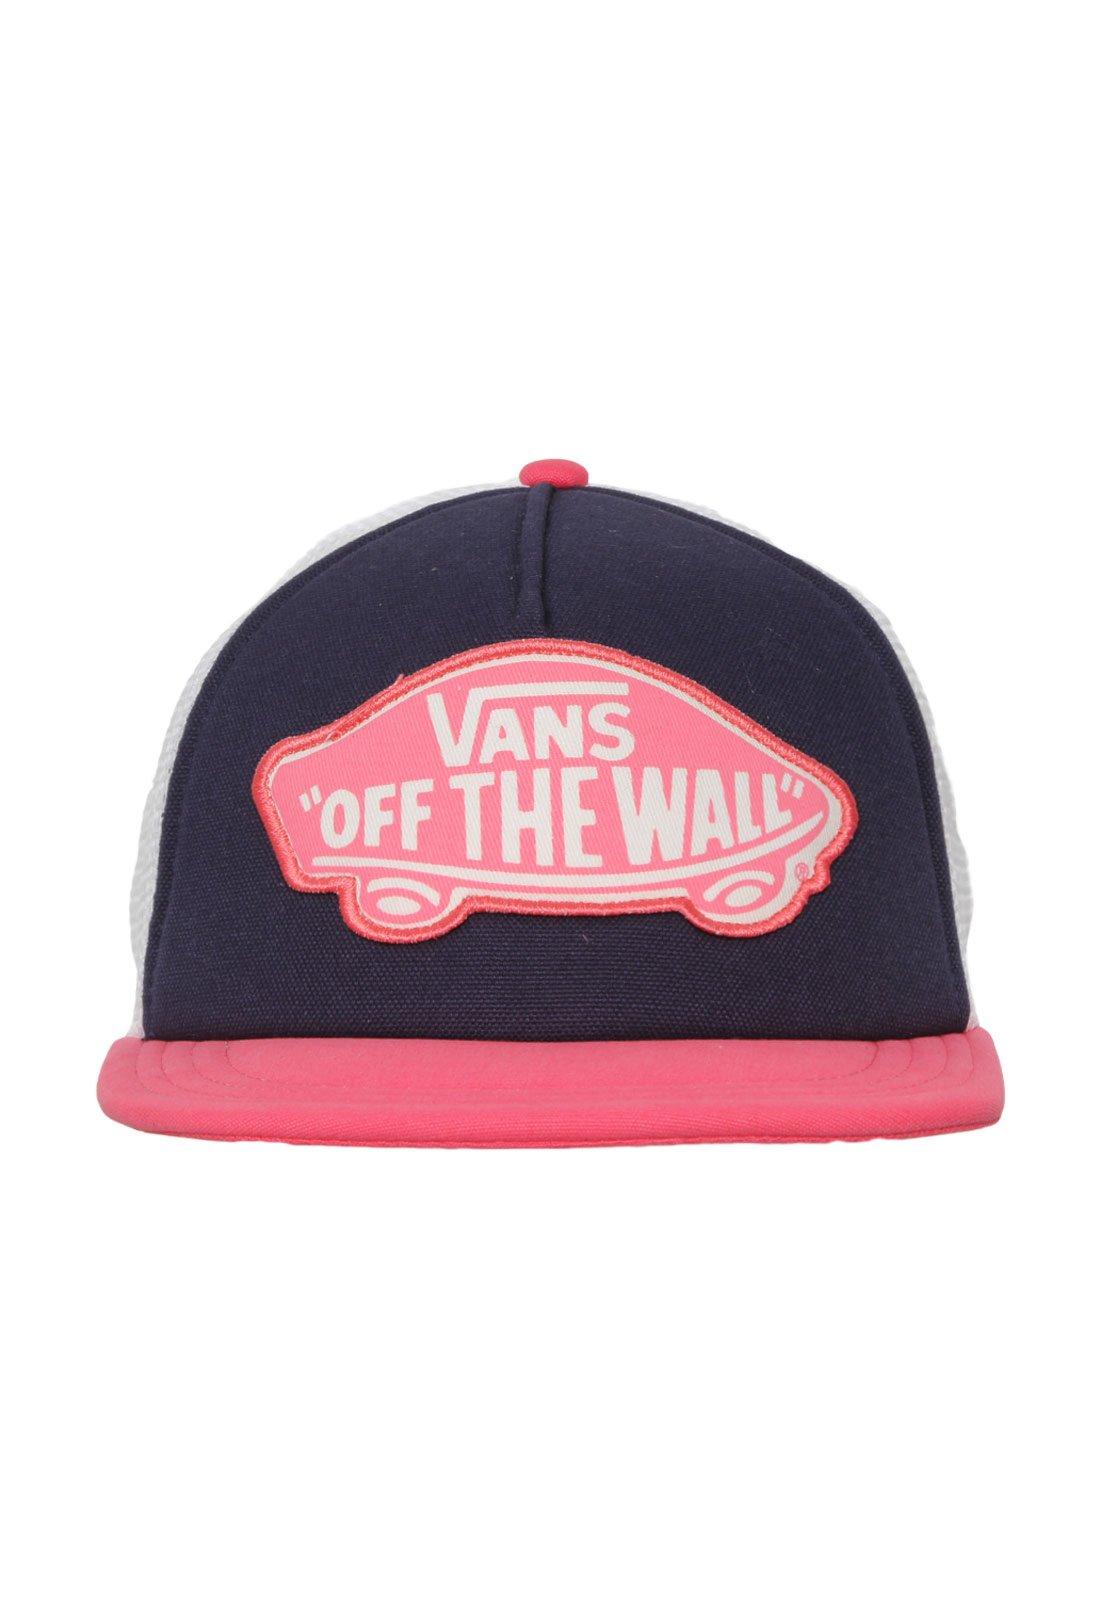 71e205865c Boné Vans Wm Beach Girl Trucker Hat Camellia Branco Rosa - Compre Agora